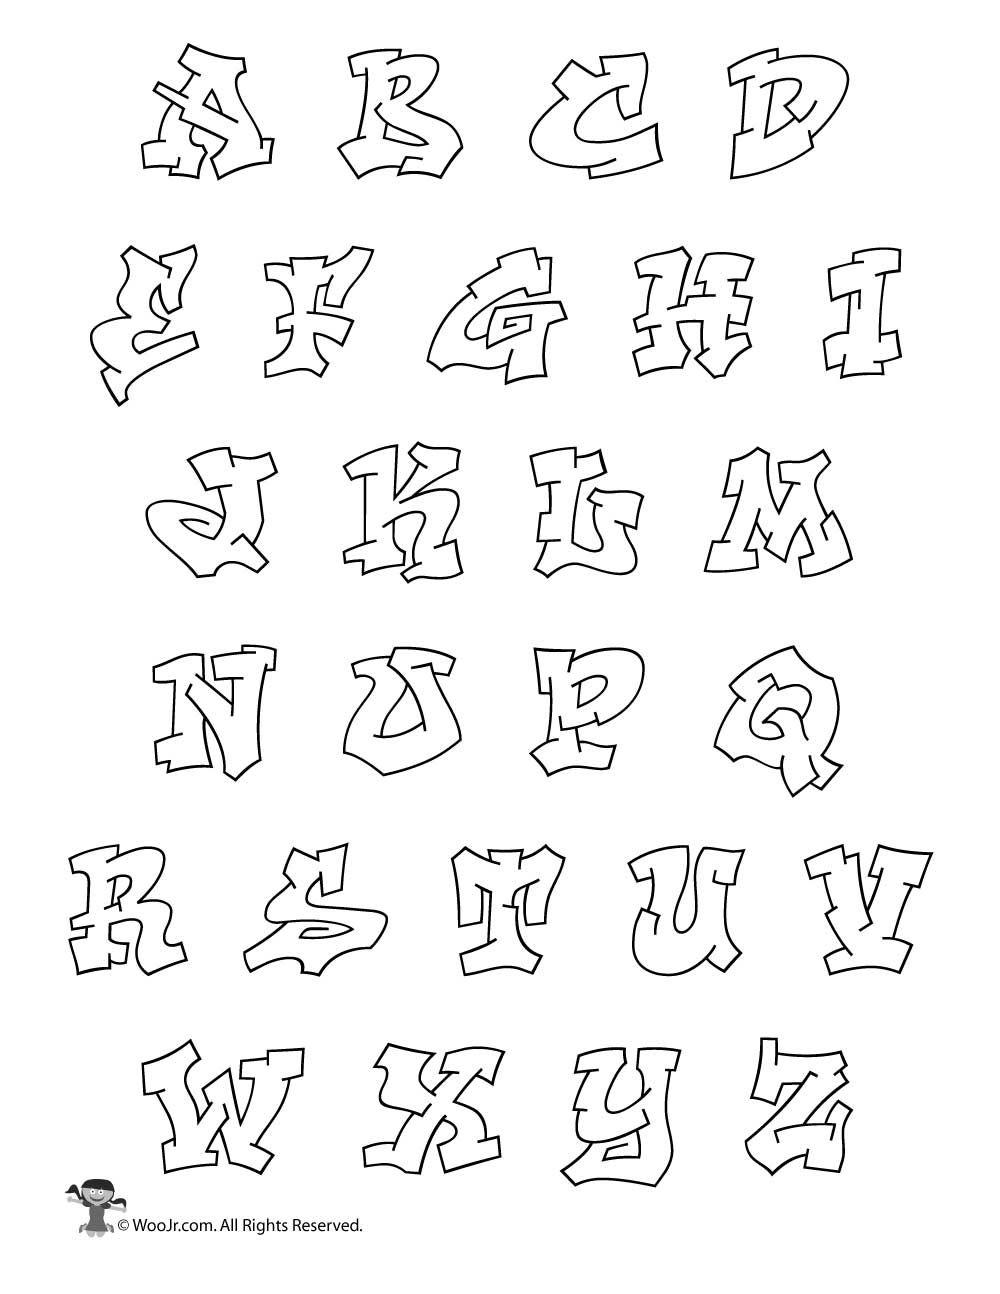 Printable Graffiti Bubble Letters Alphabet Woo Jr Kids Activities Lettering Alphabet Graffiti Lettering Alphabet Graffiti Lettering Fonts